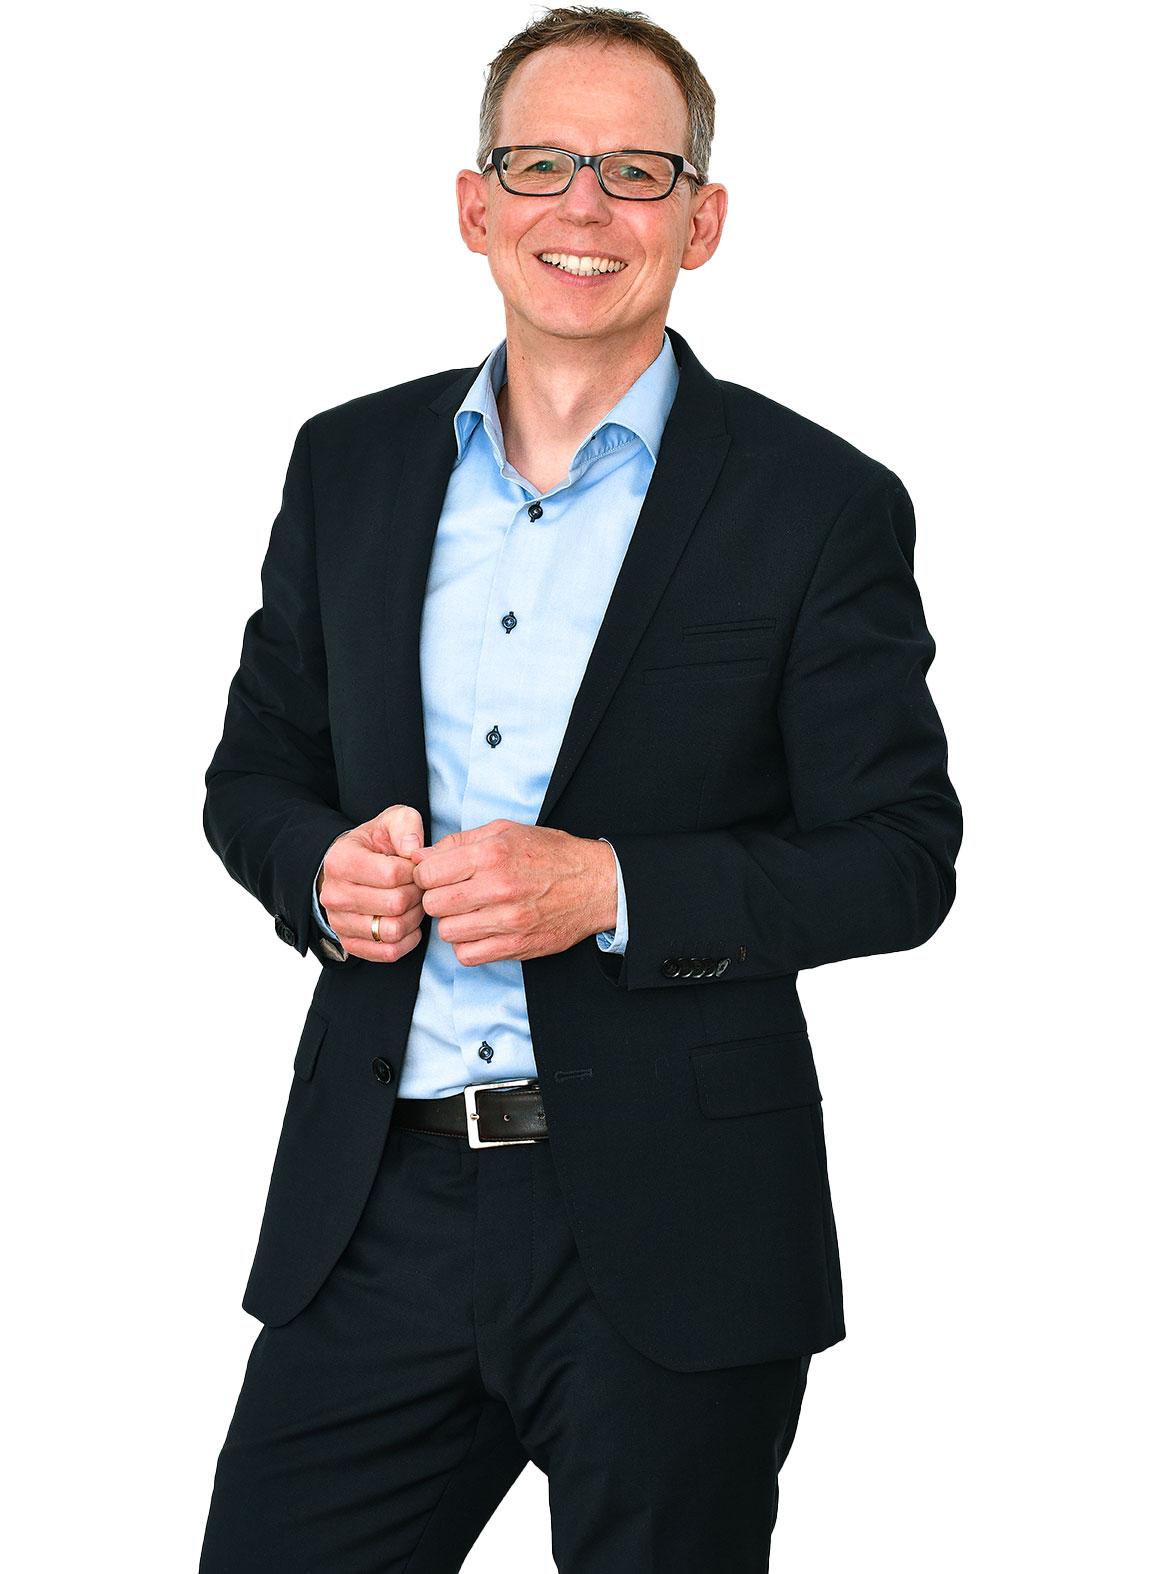 Dirk Trinn